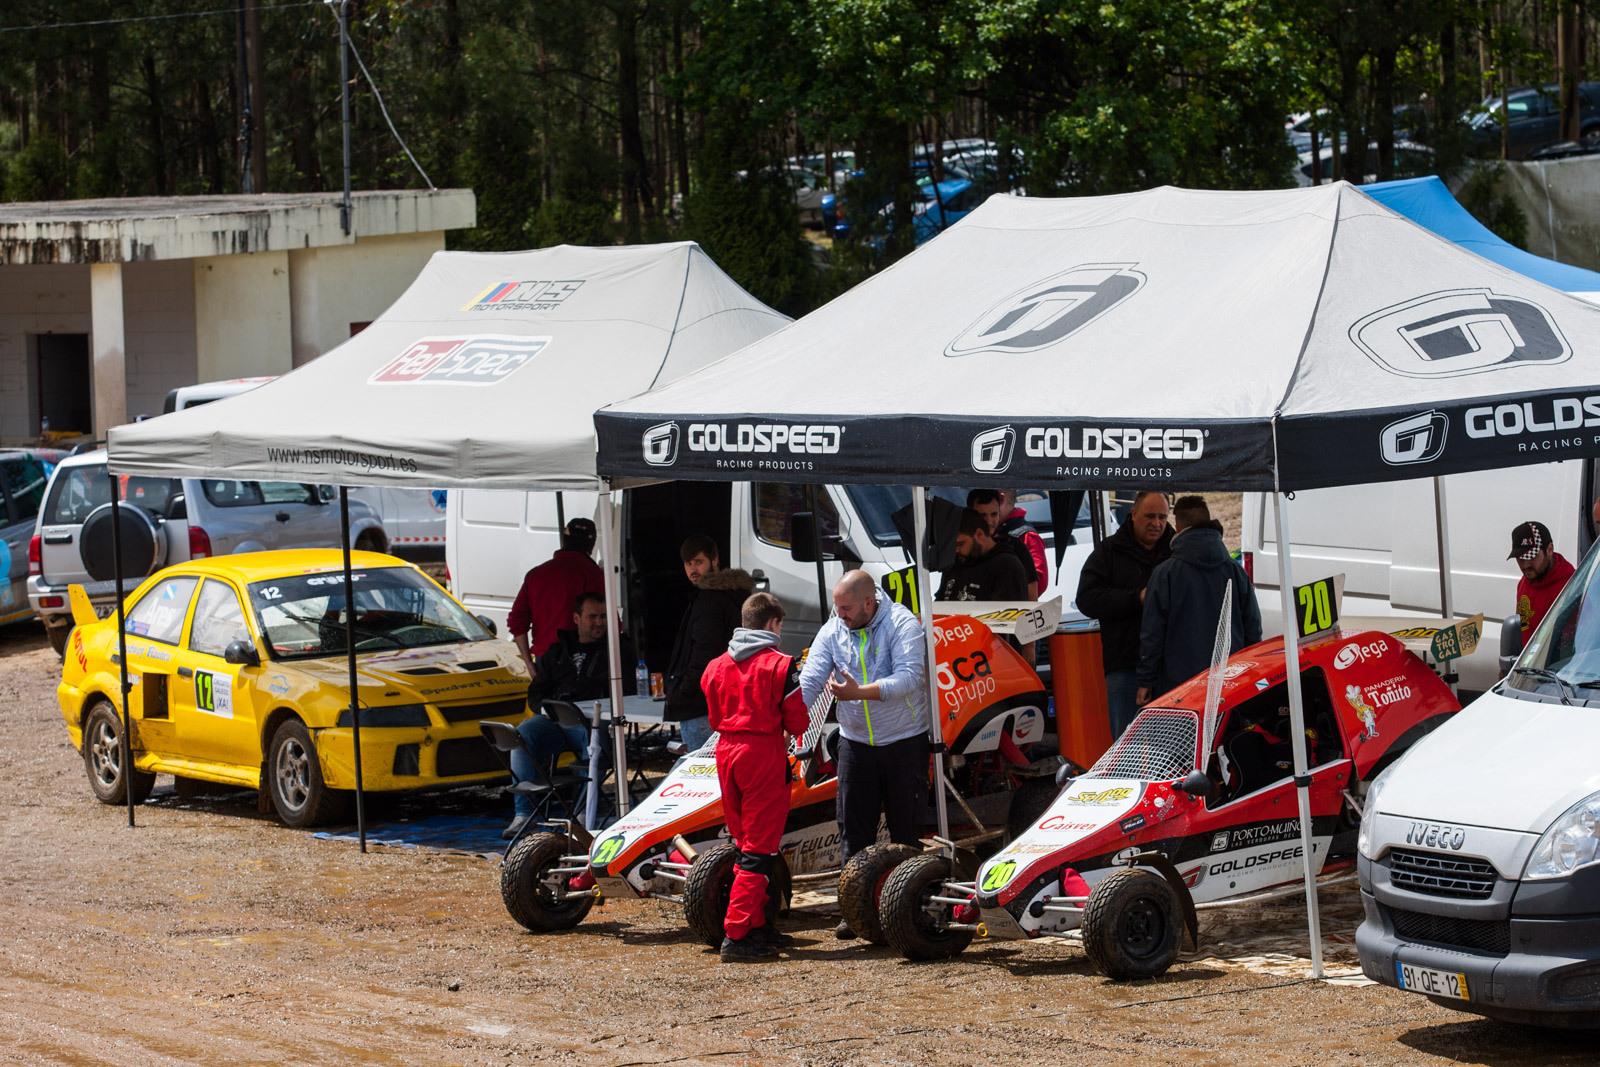 005 Autocross Carballo FGA 2016 002